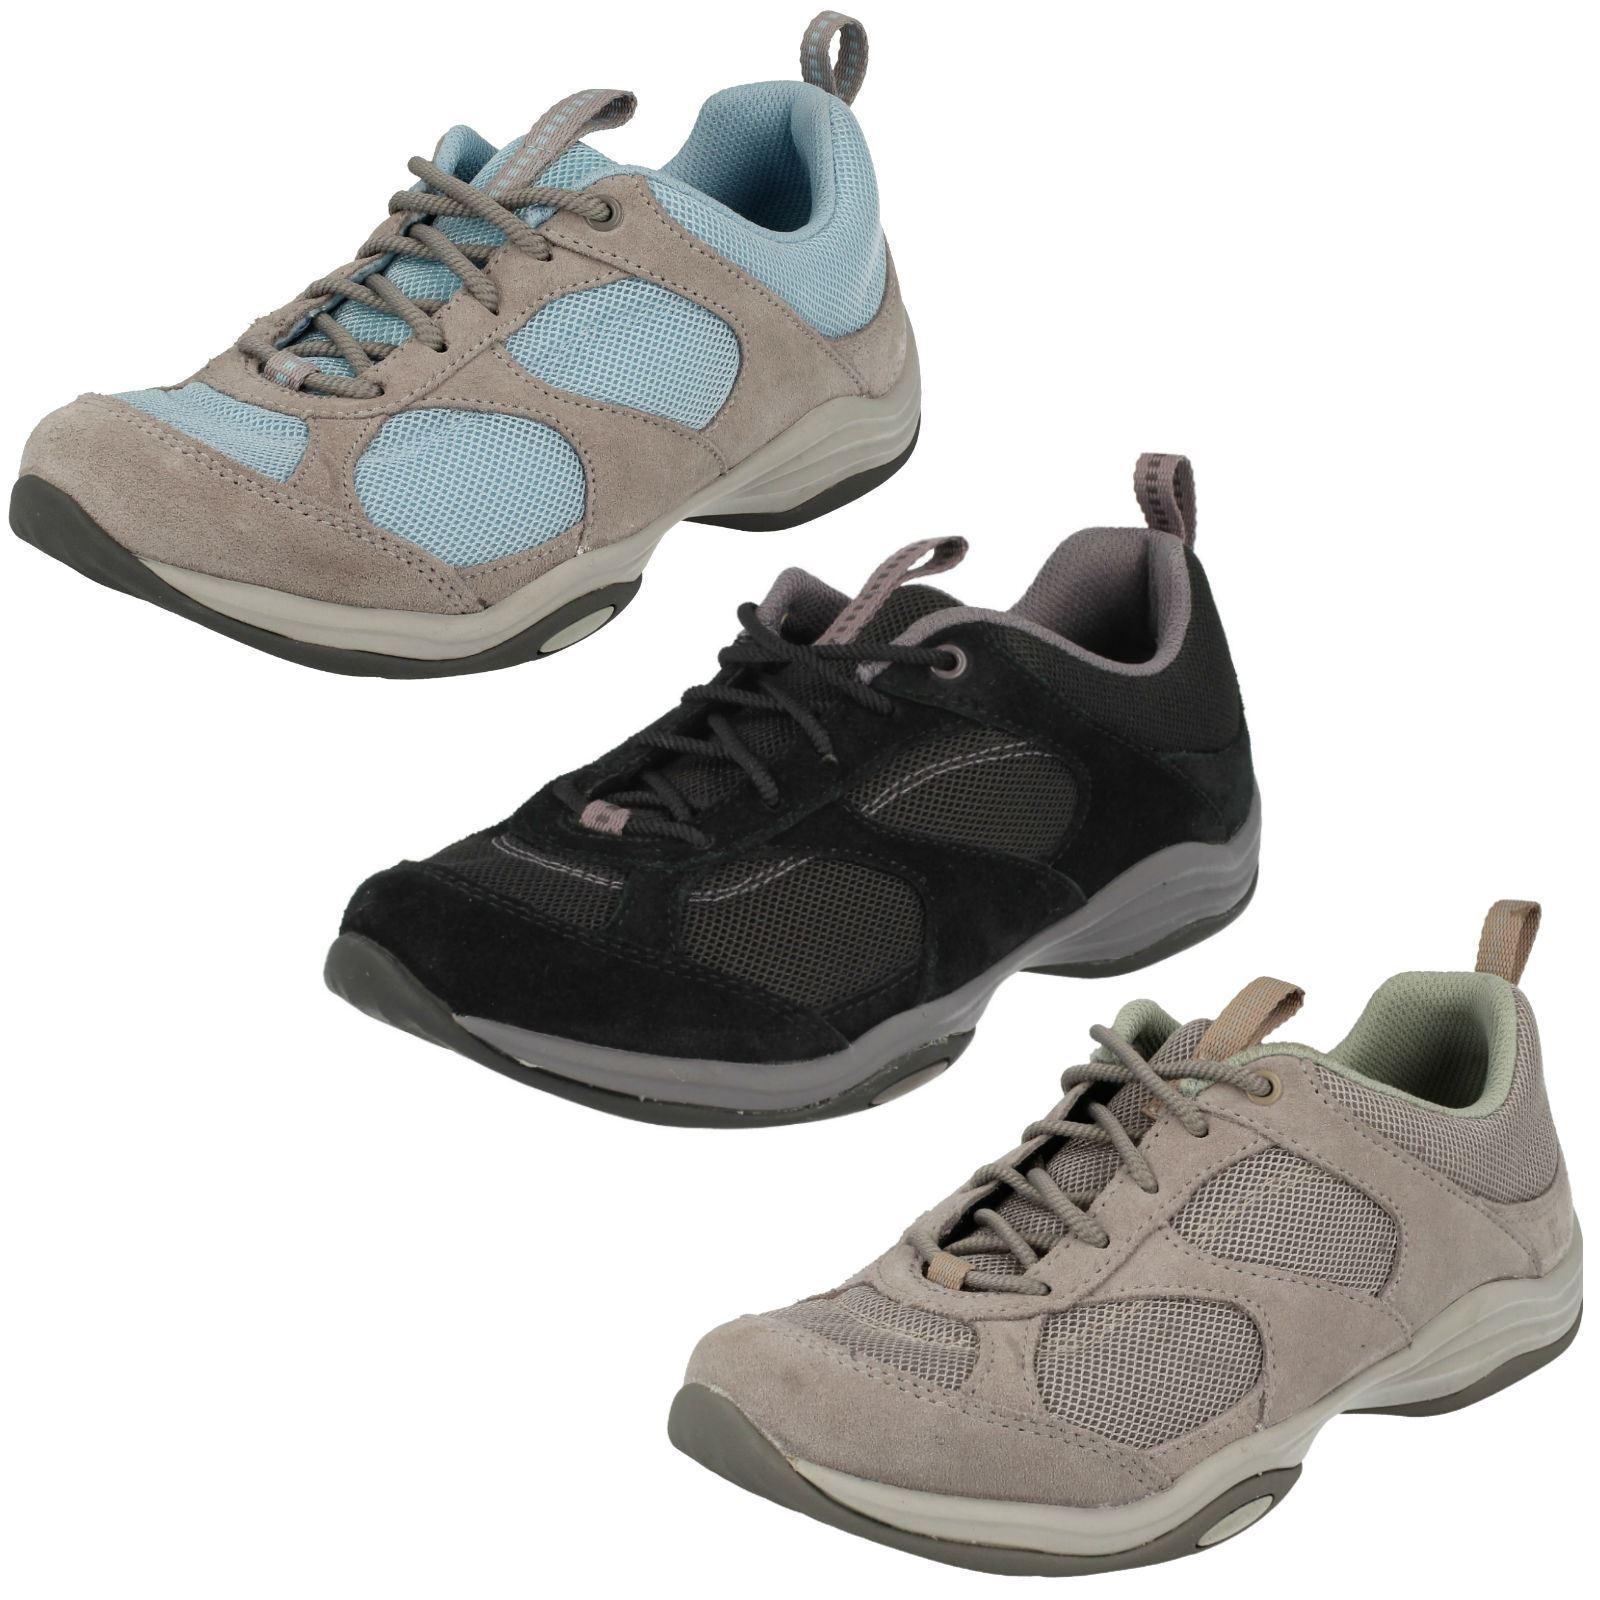 LADIES CLARKS SUEDE LACE UP  EVERYDAY WALKING TREK TRAINERS chaussures INWALK AIR